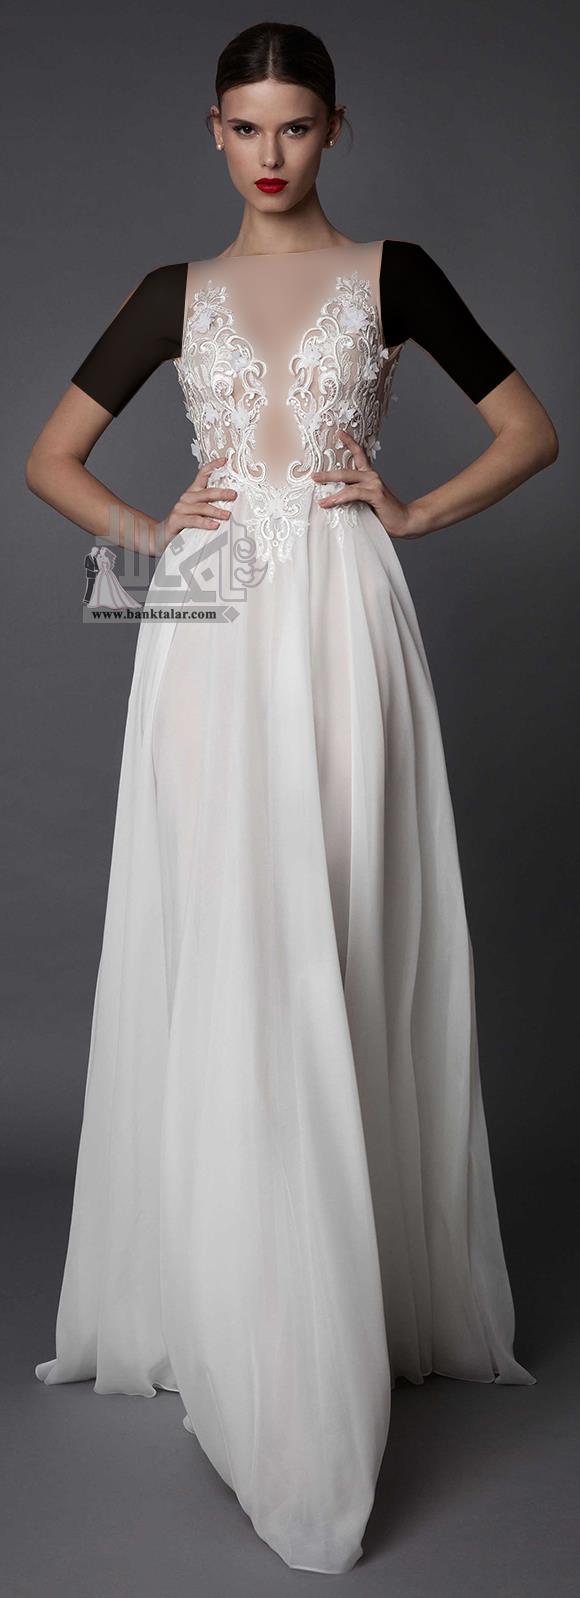 لباس عروس دانتل 2017